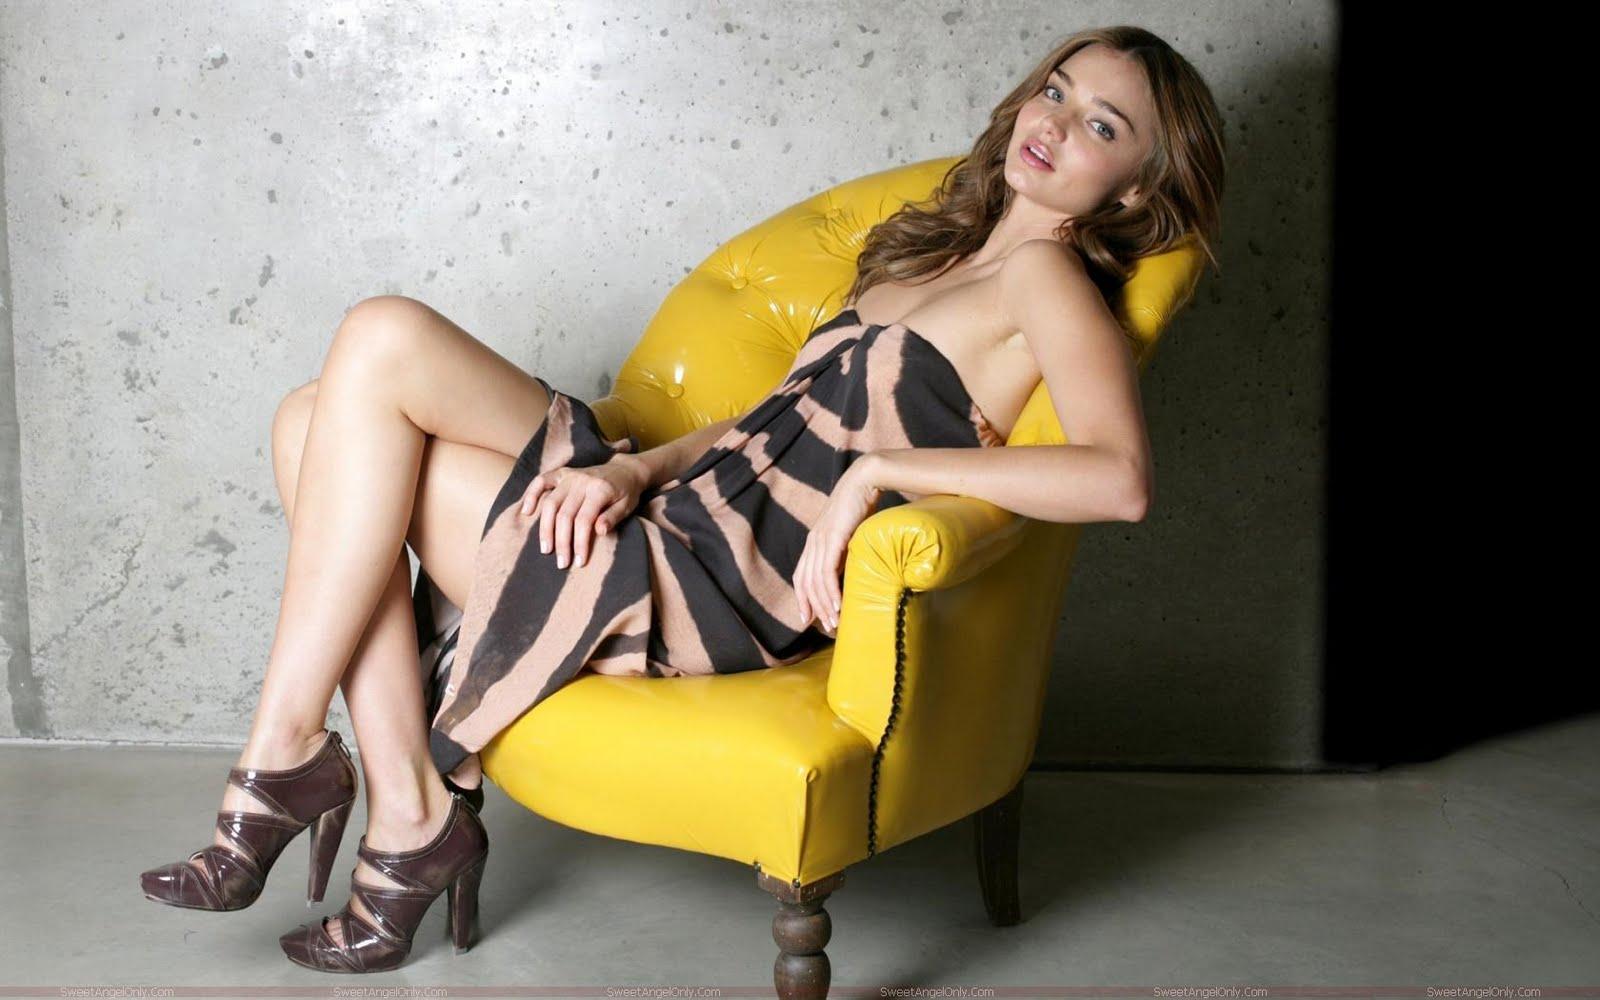 http://2.bp.blogspot.com/-afsJGAIT3I4/TZHnHa1Z0MI/AAAAAAAAGH8/hLDDkhmwTrQ/s1600/miranda_kerr_fashion_model_wallpaper_sweetangelonly_03.jpg